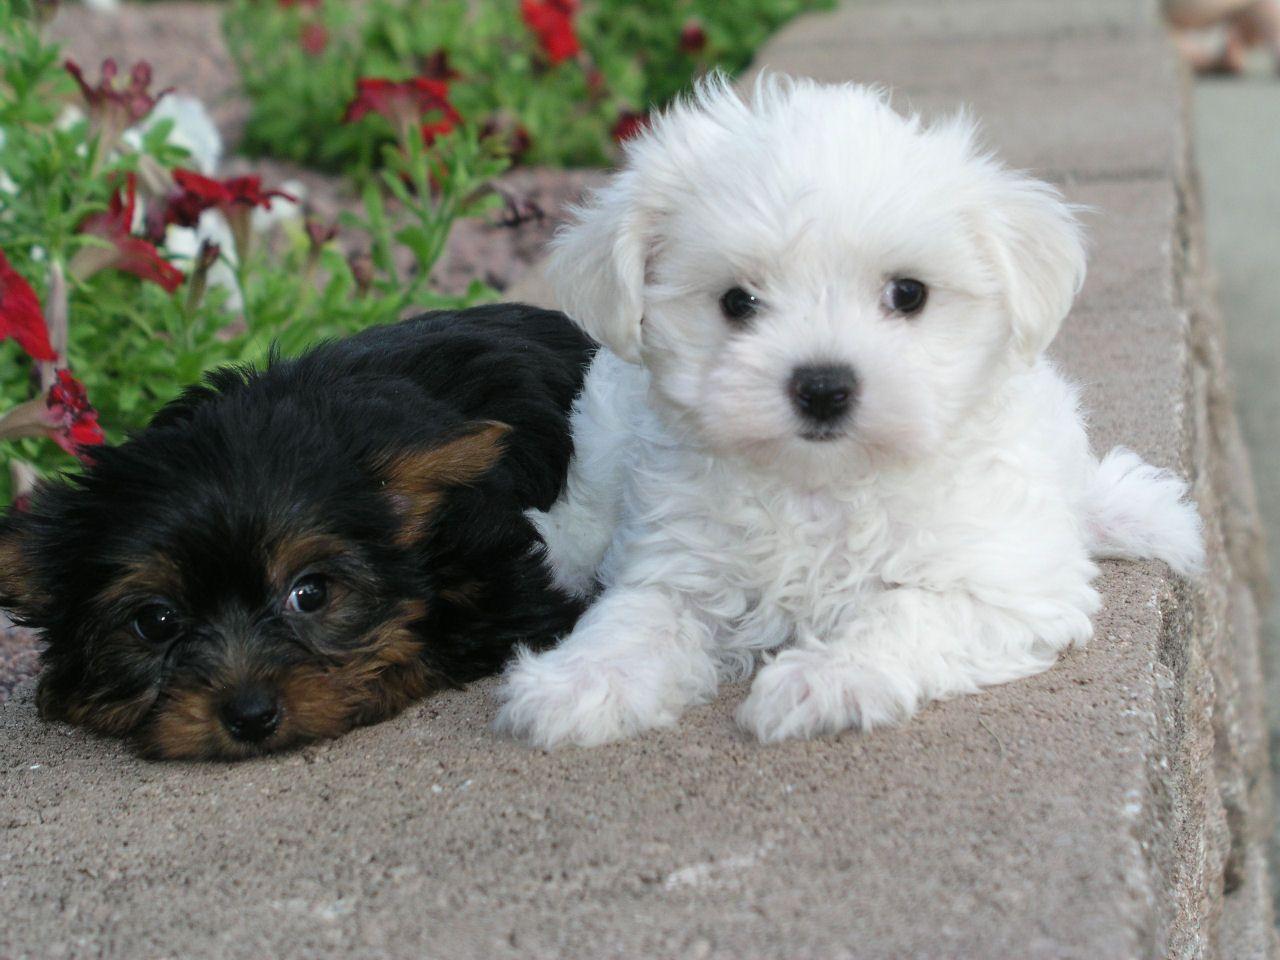 Cute Shih Tzu Puppies Dogs Puppies Puppies Kitties Shih Tzu